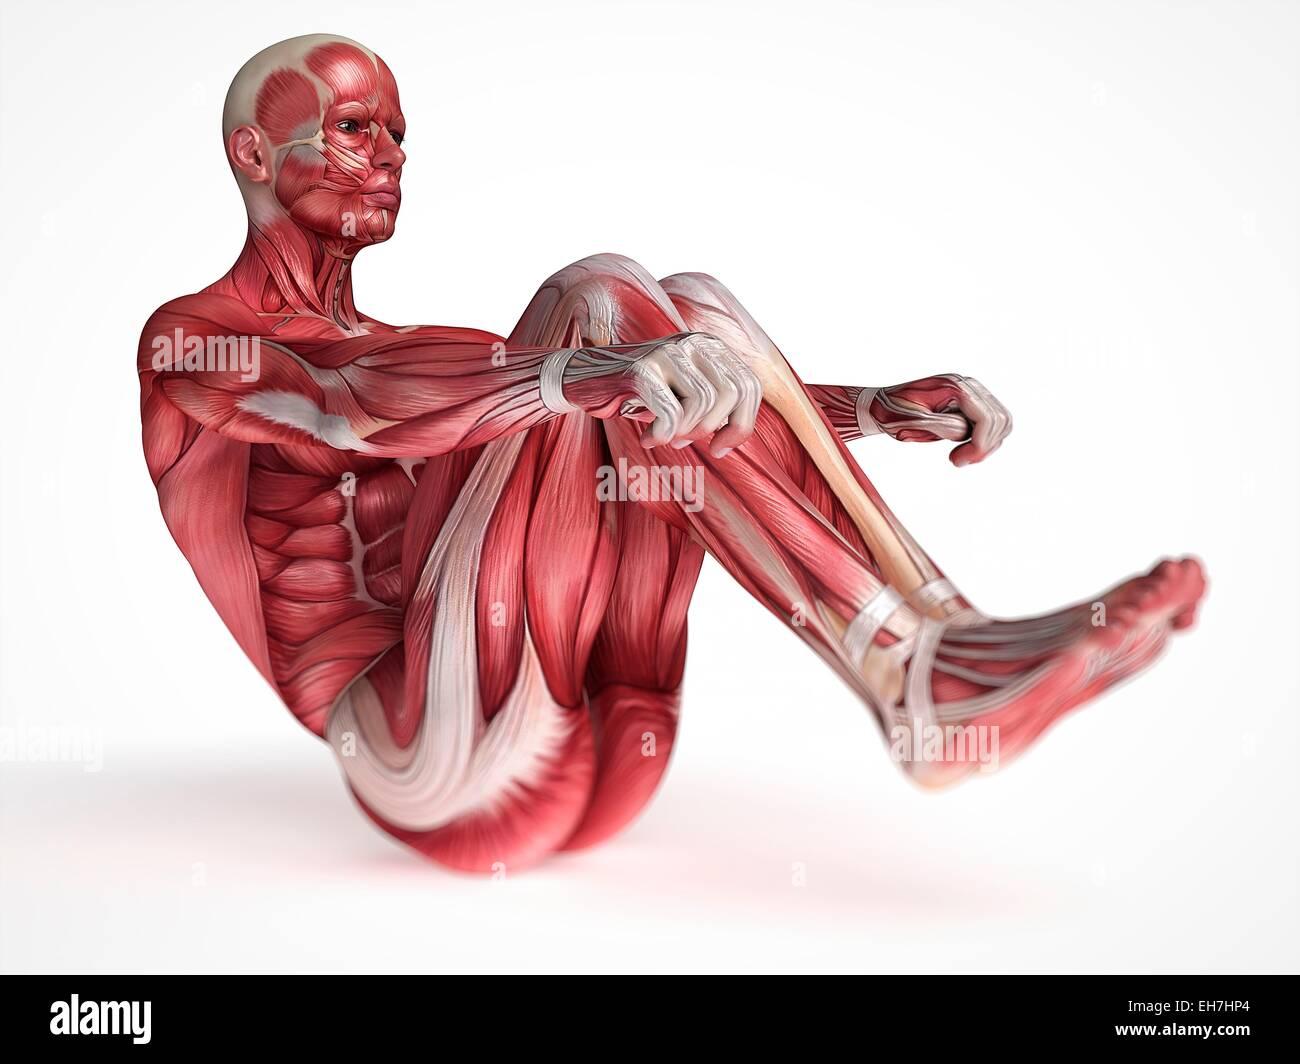 Human Muscular System And Stretching Stock Photos Human Muscular